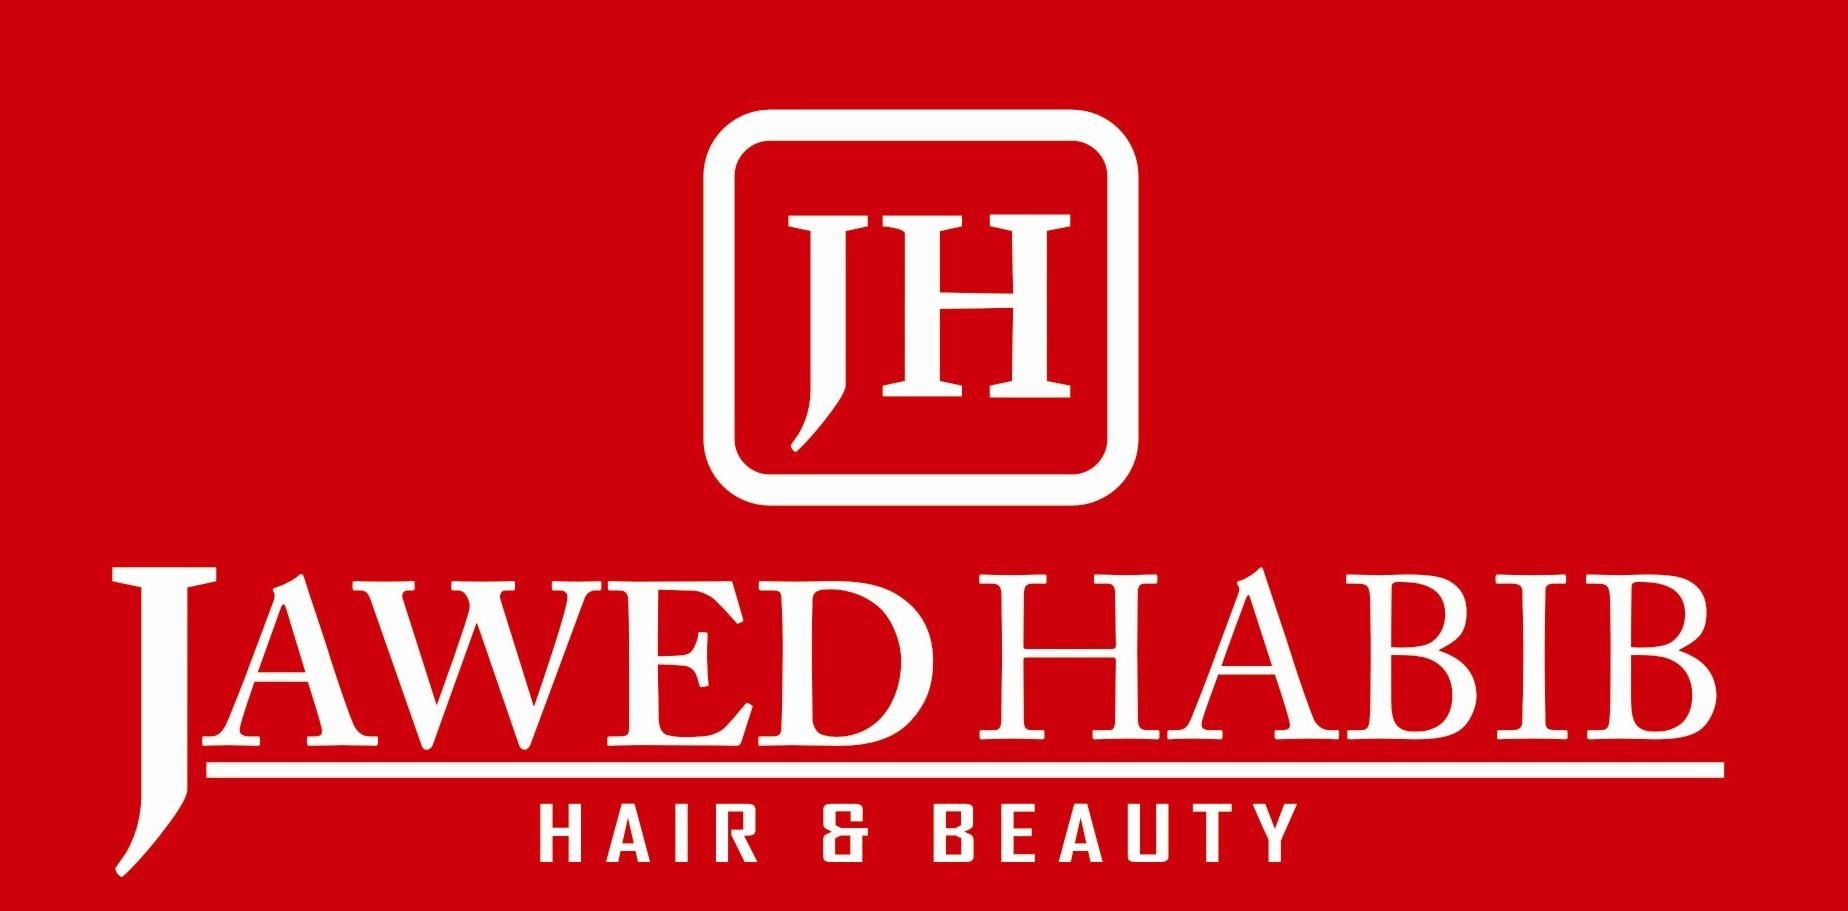 Jawed Habib Hair & Beauty Salons - Banugudi Centre - Kakinada Image